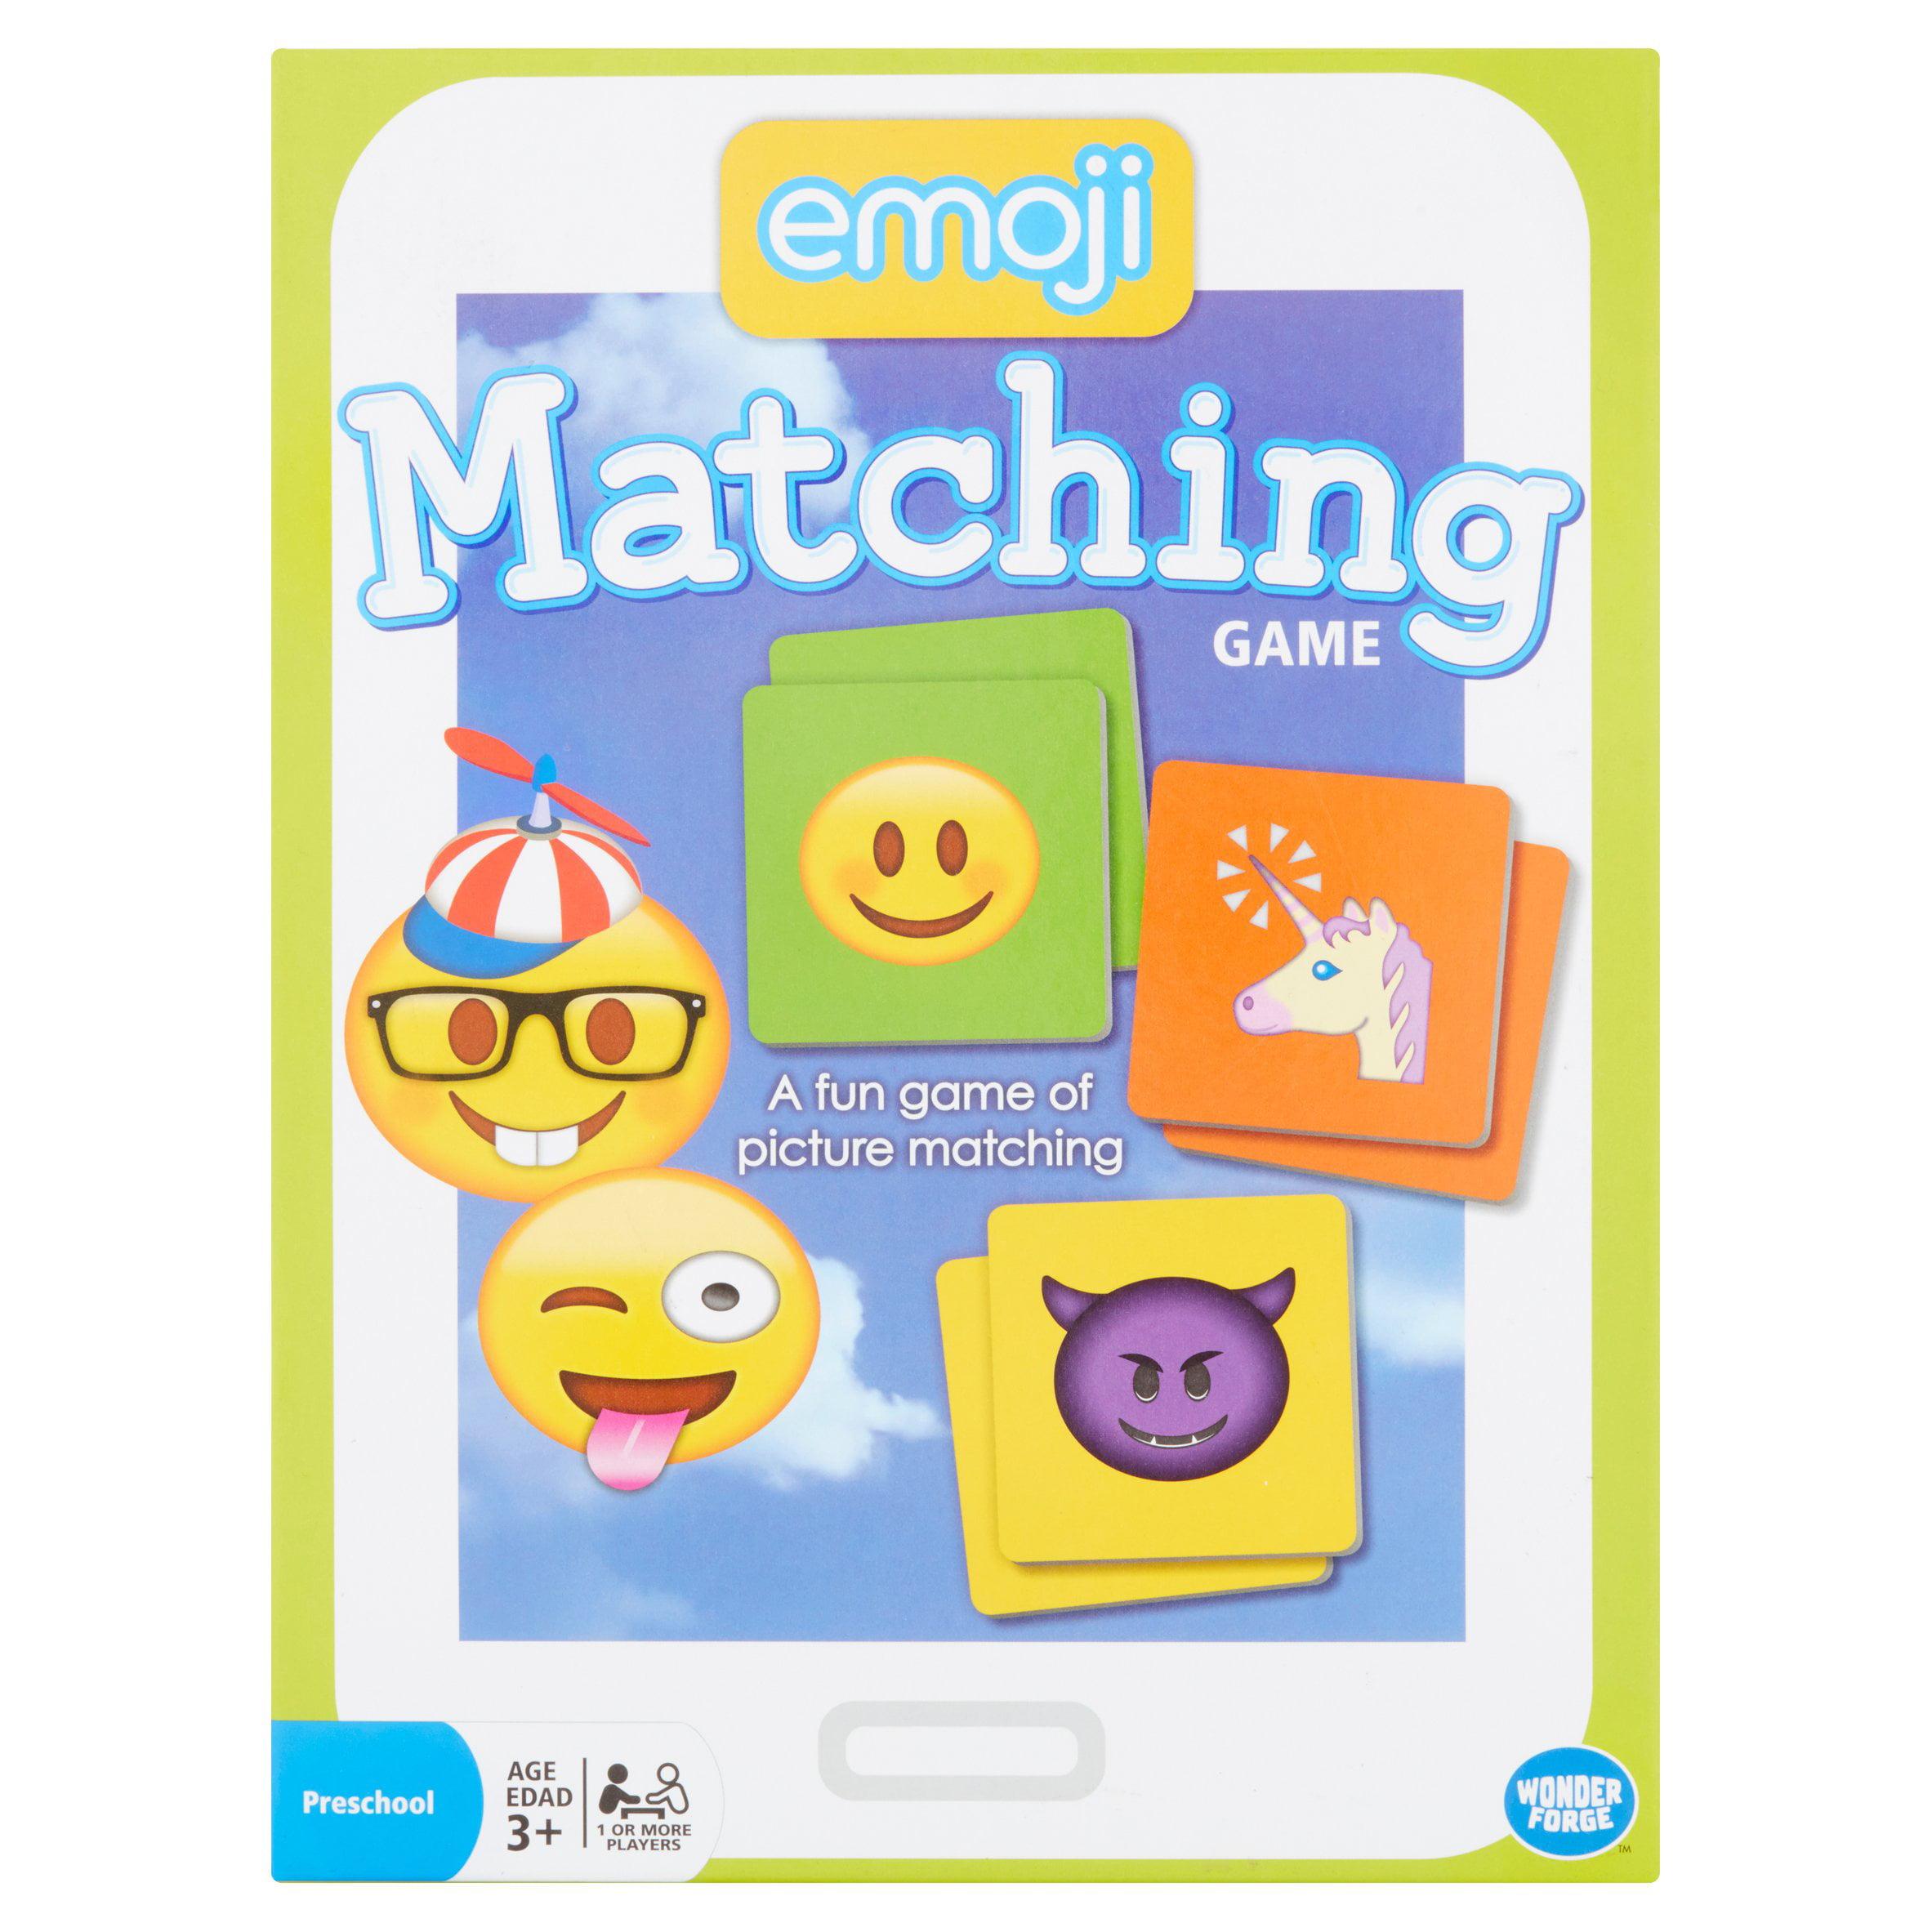 Wonder Forge Emoji Matching Preschool Game Age 3+